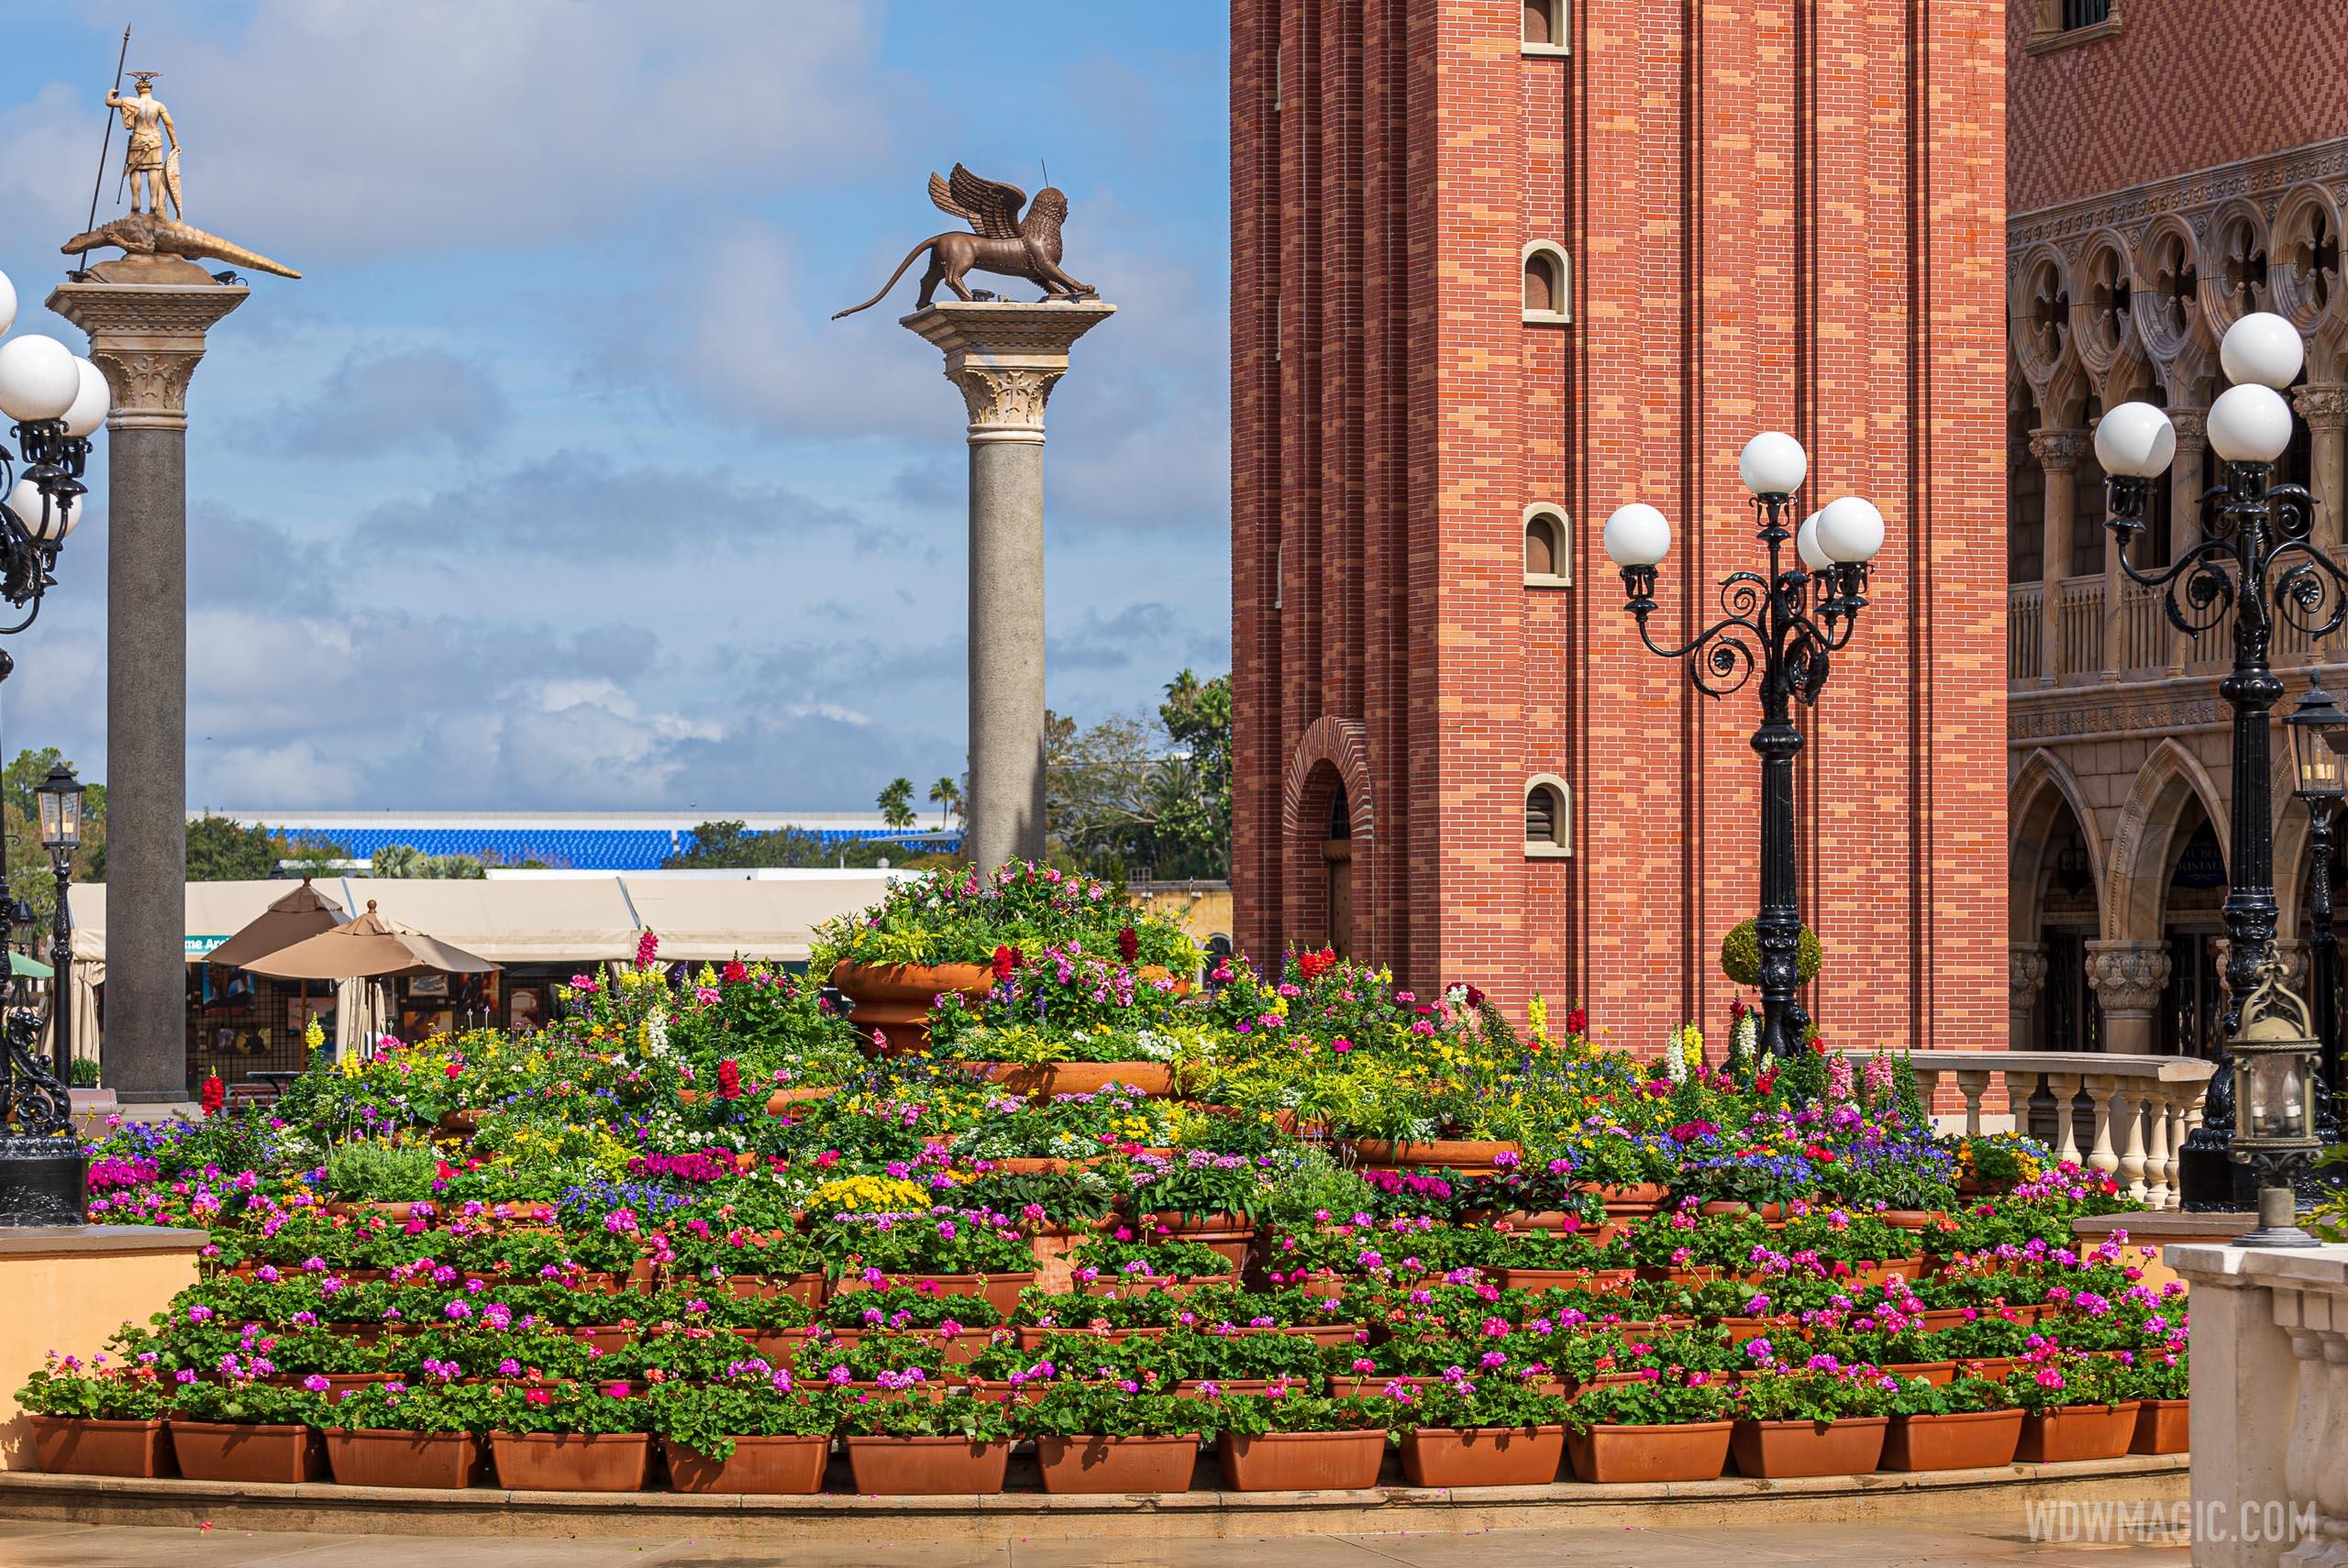 Italy Pavilion flowers - February 2021